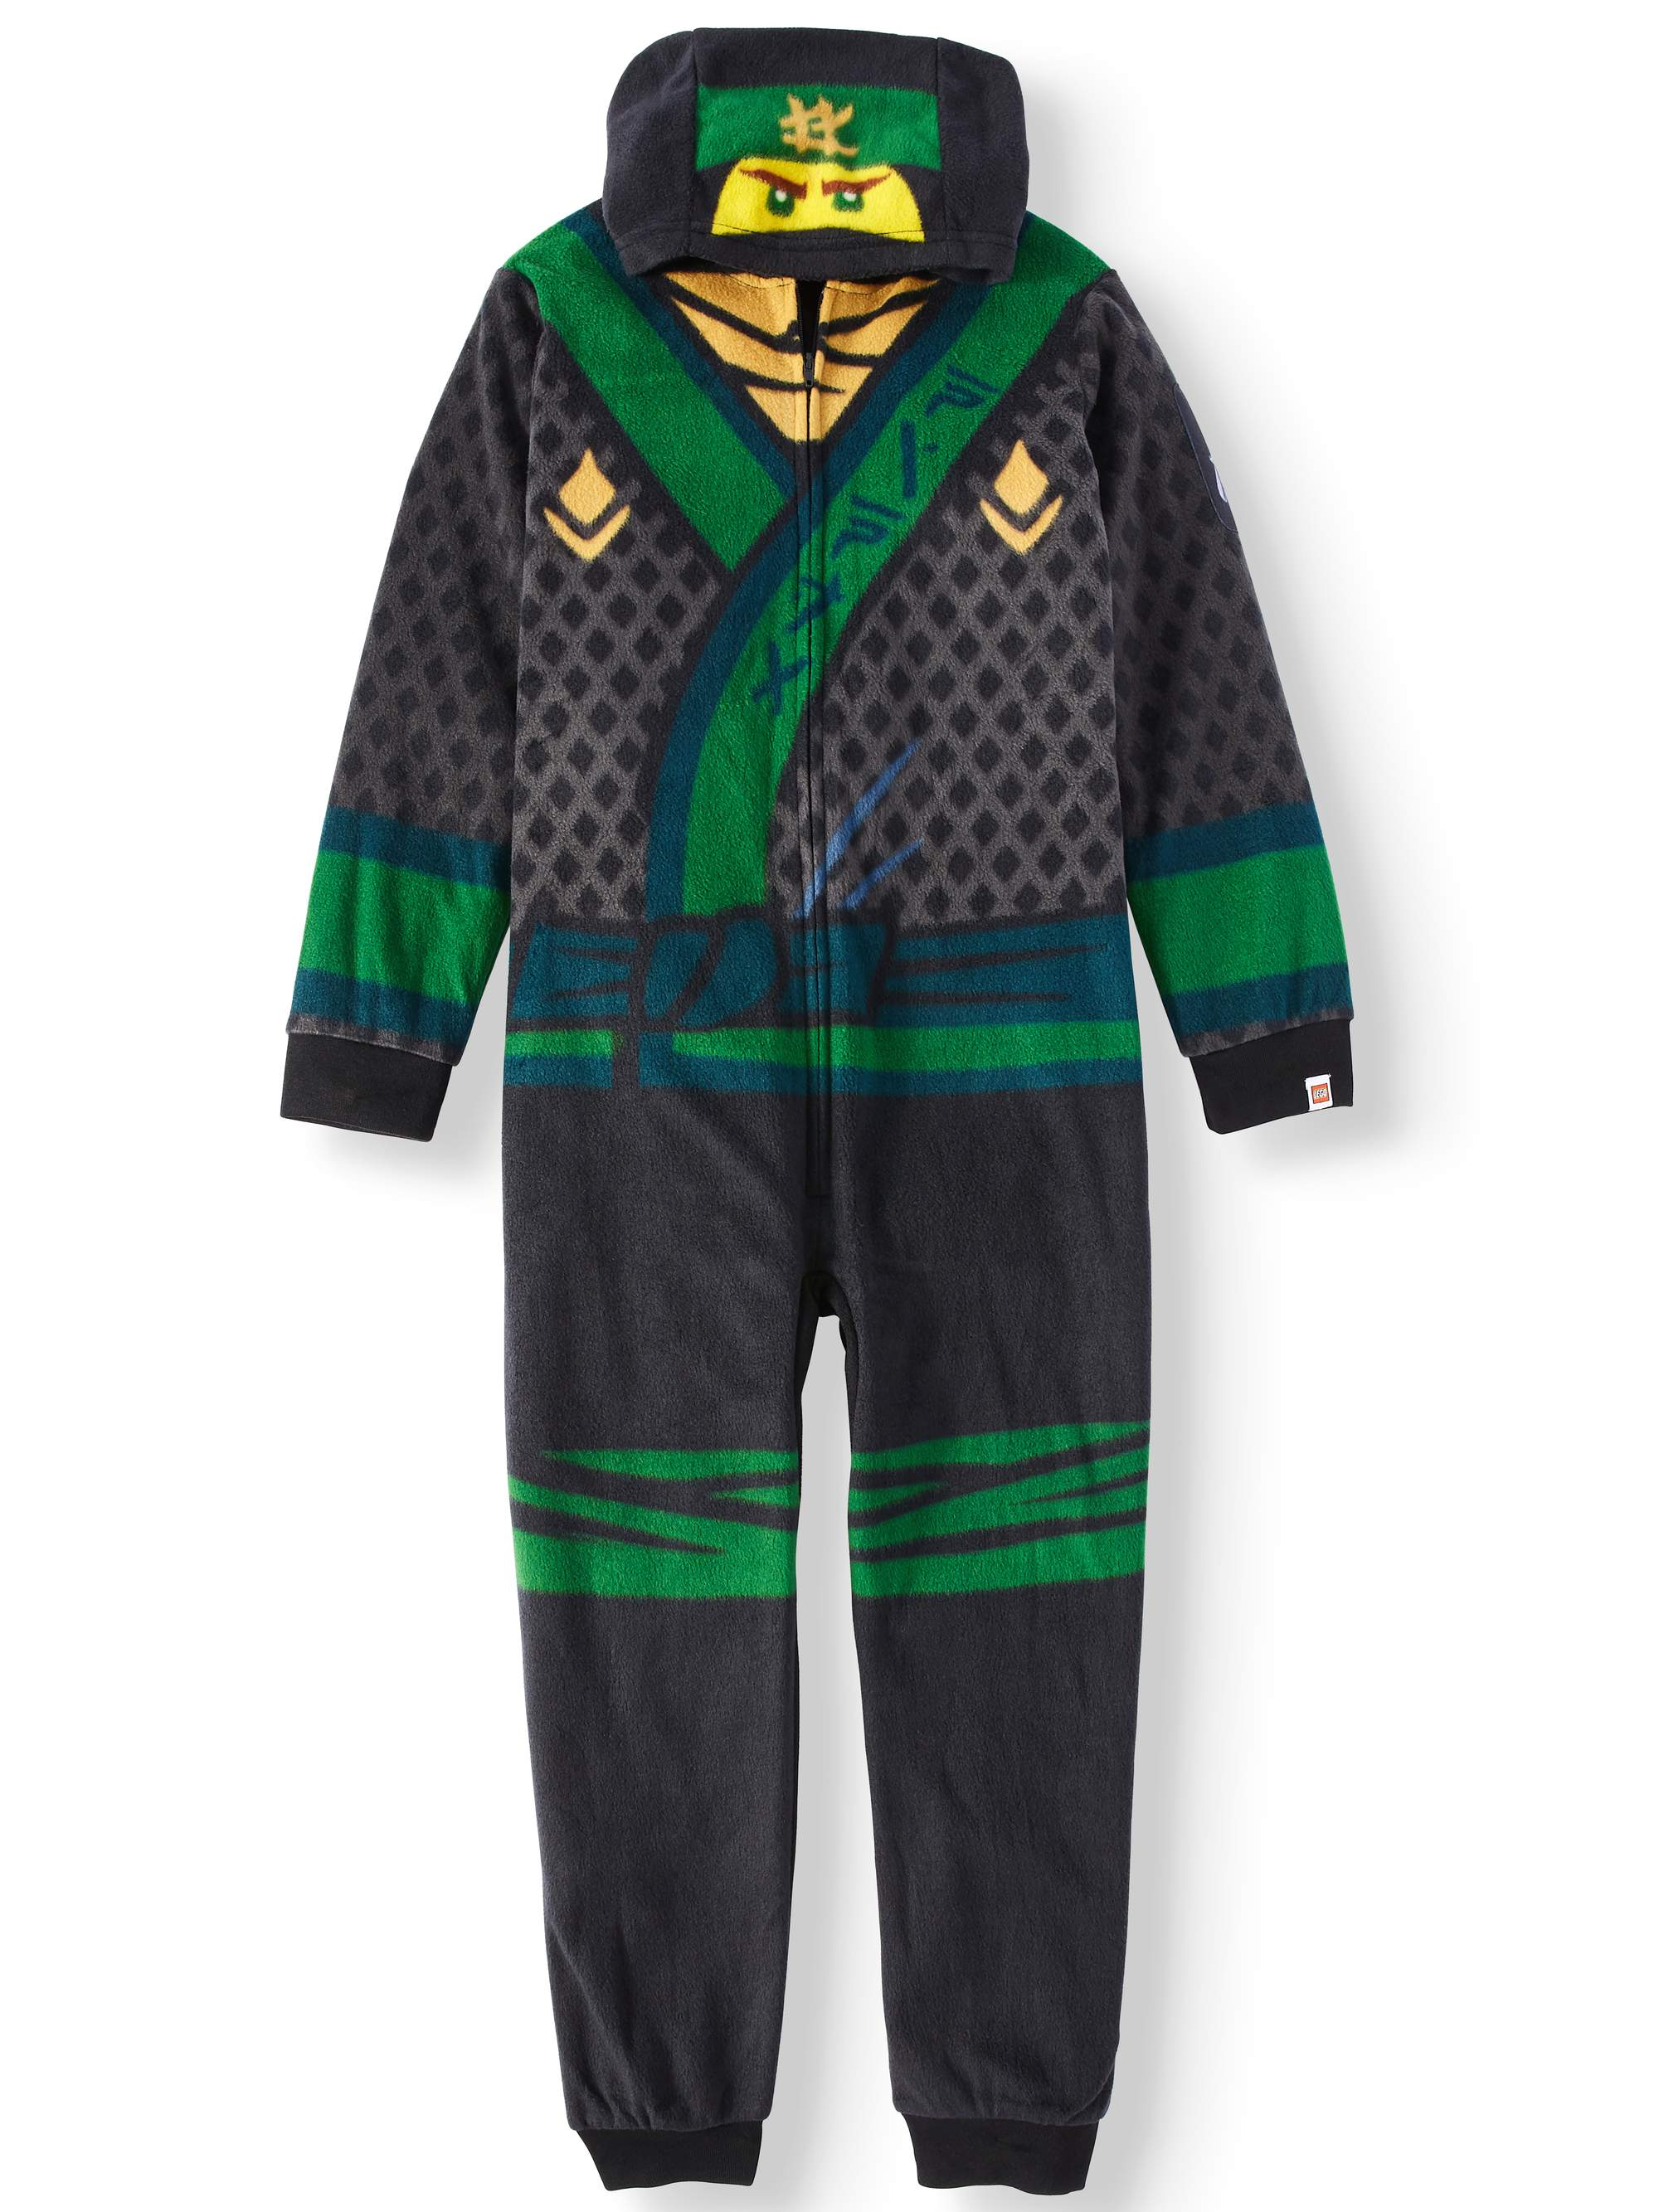 Boy's Hooded Lego Ninjago Union Suit Onesie Pajama Sleep Set (Big Boys & Little Boys)